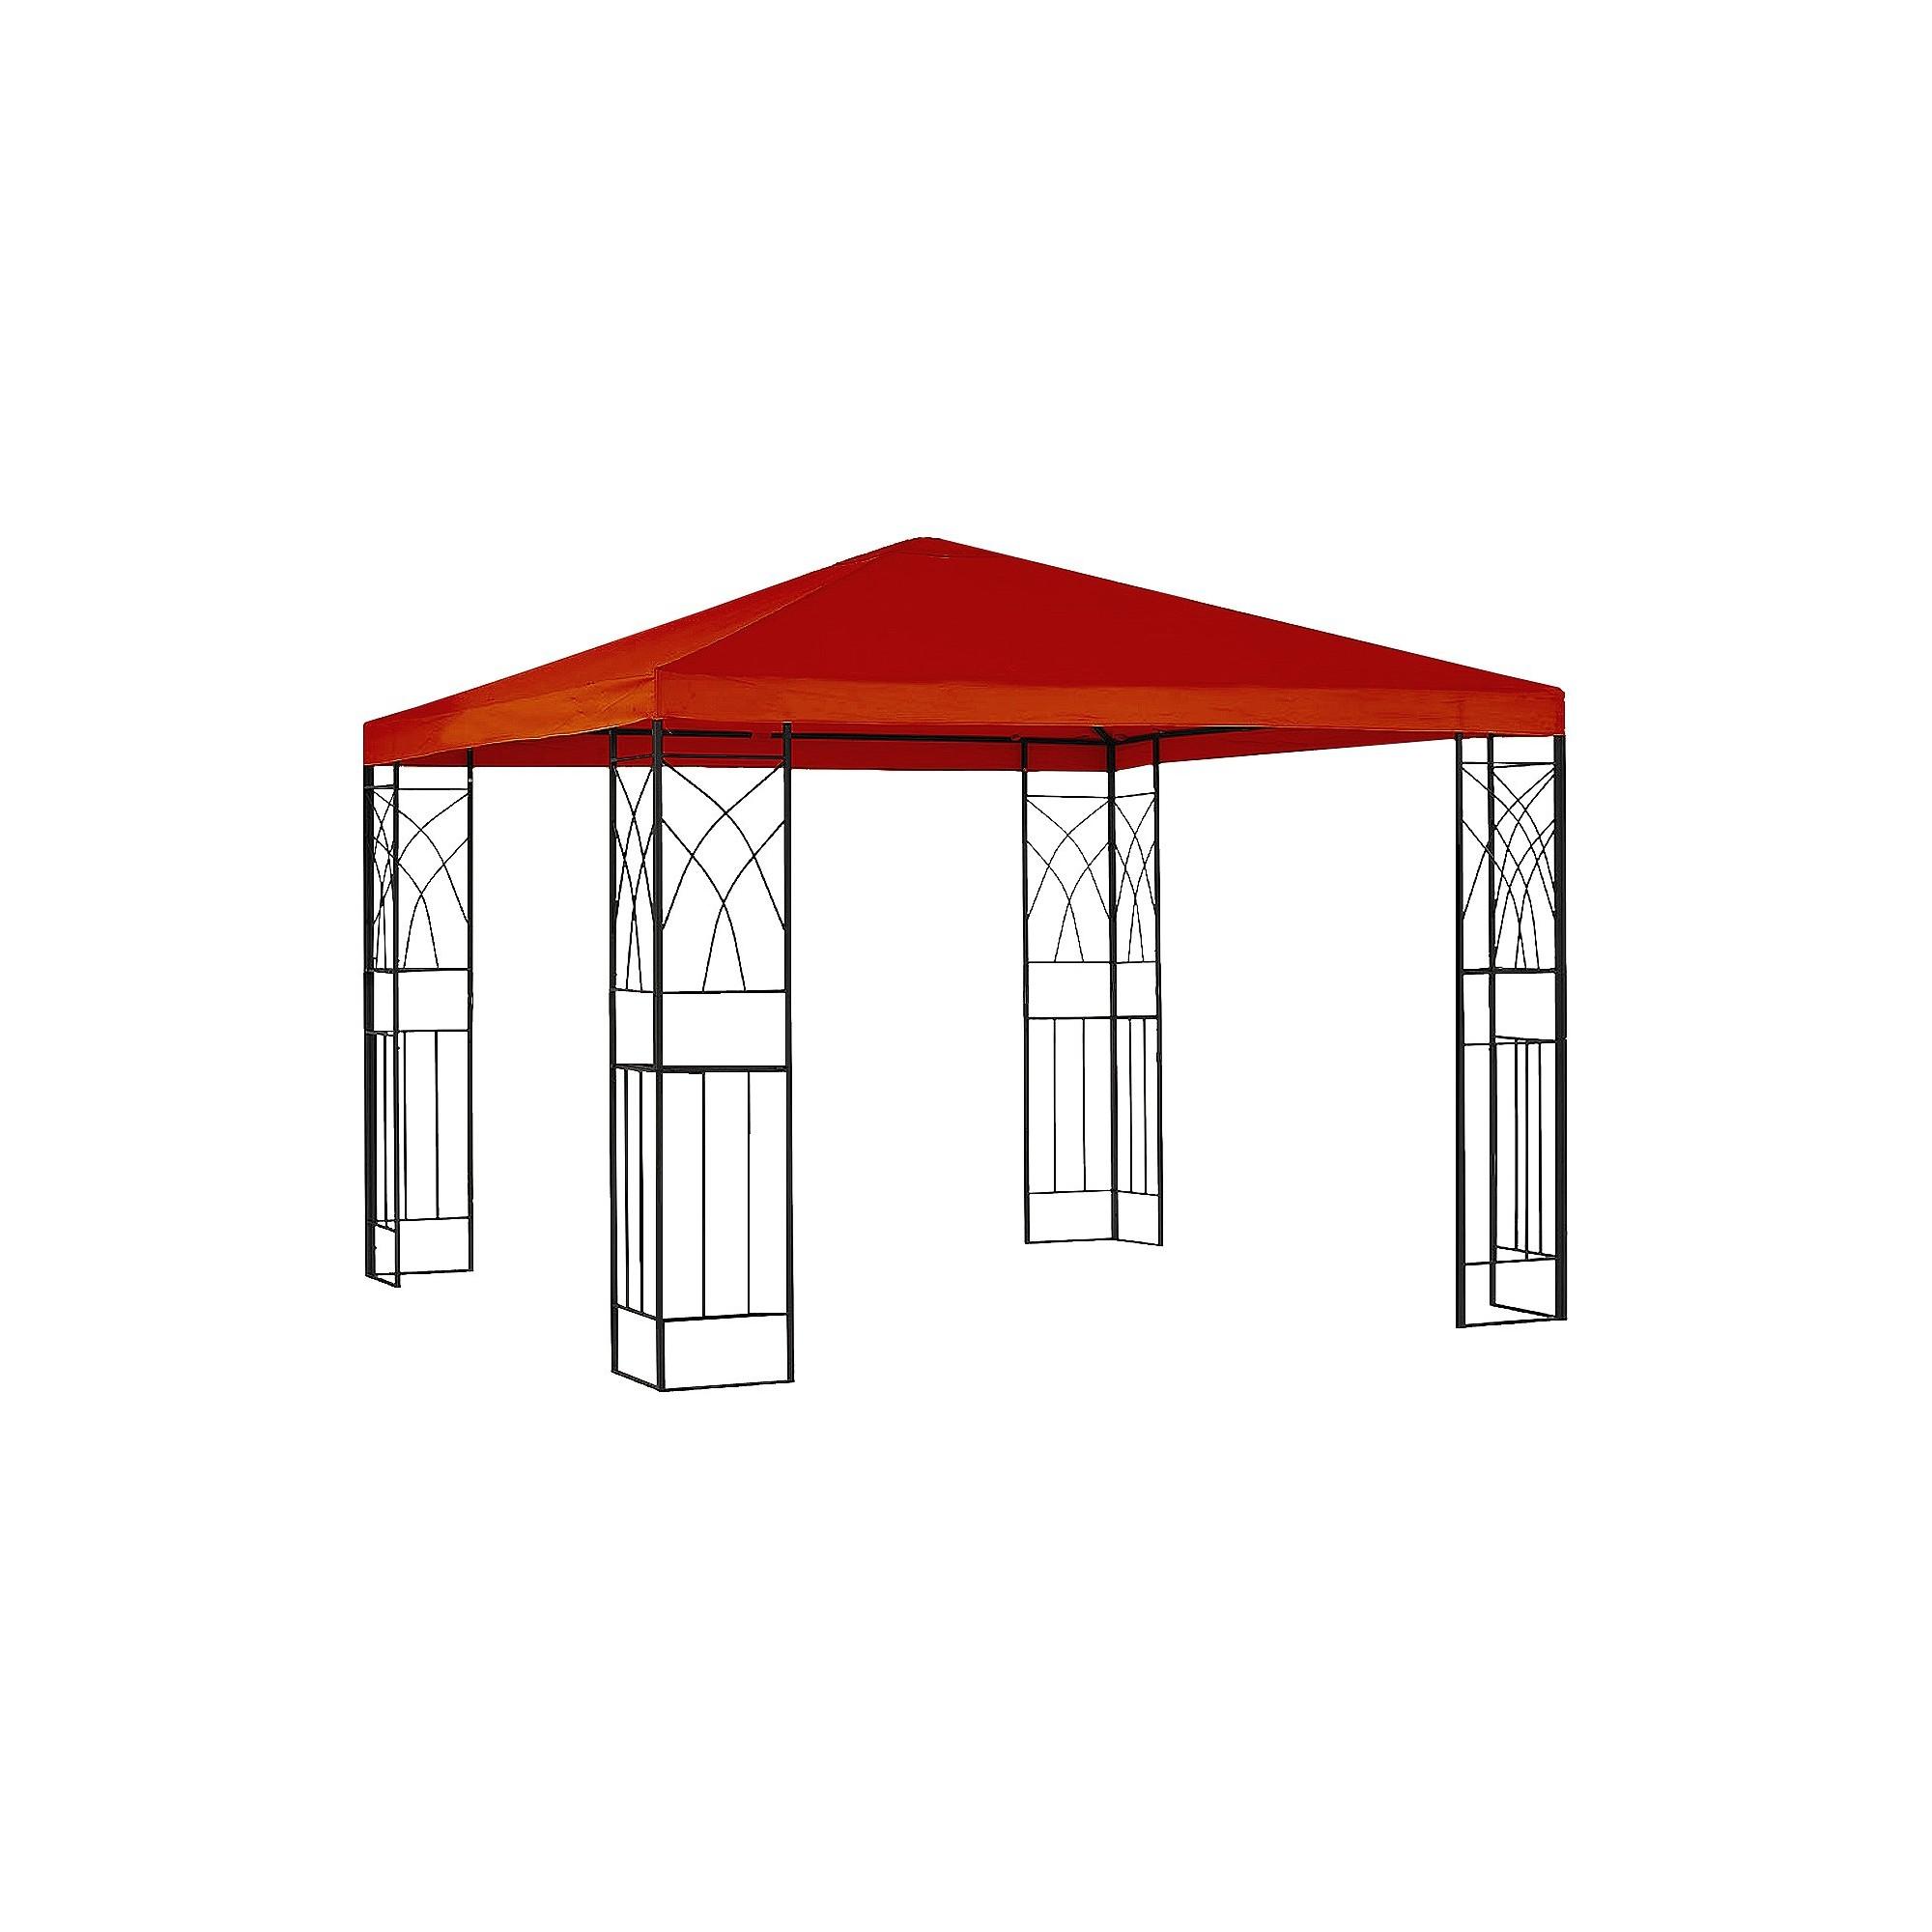 10x10u0027 Replacement Gazebo Canopy - Red - Room Essentials  sc 1 st  Pinterest & 10x10u0027 Replacement Gazebo Canopy - Red - Room Essentials | Red ...